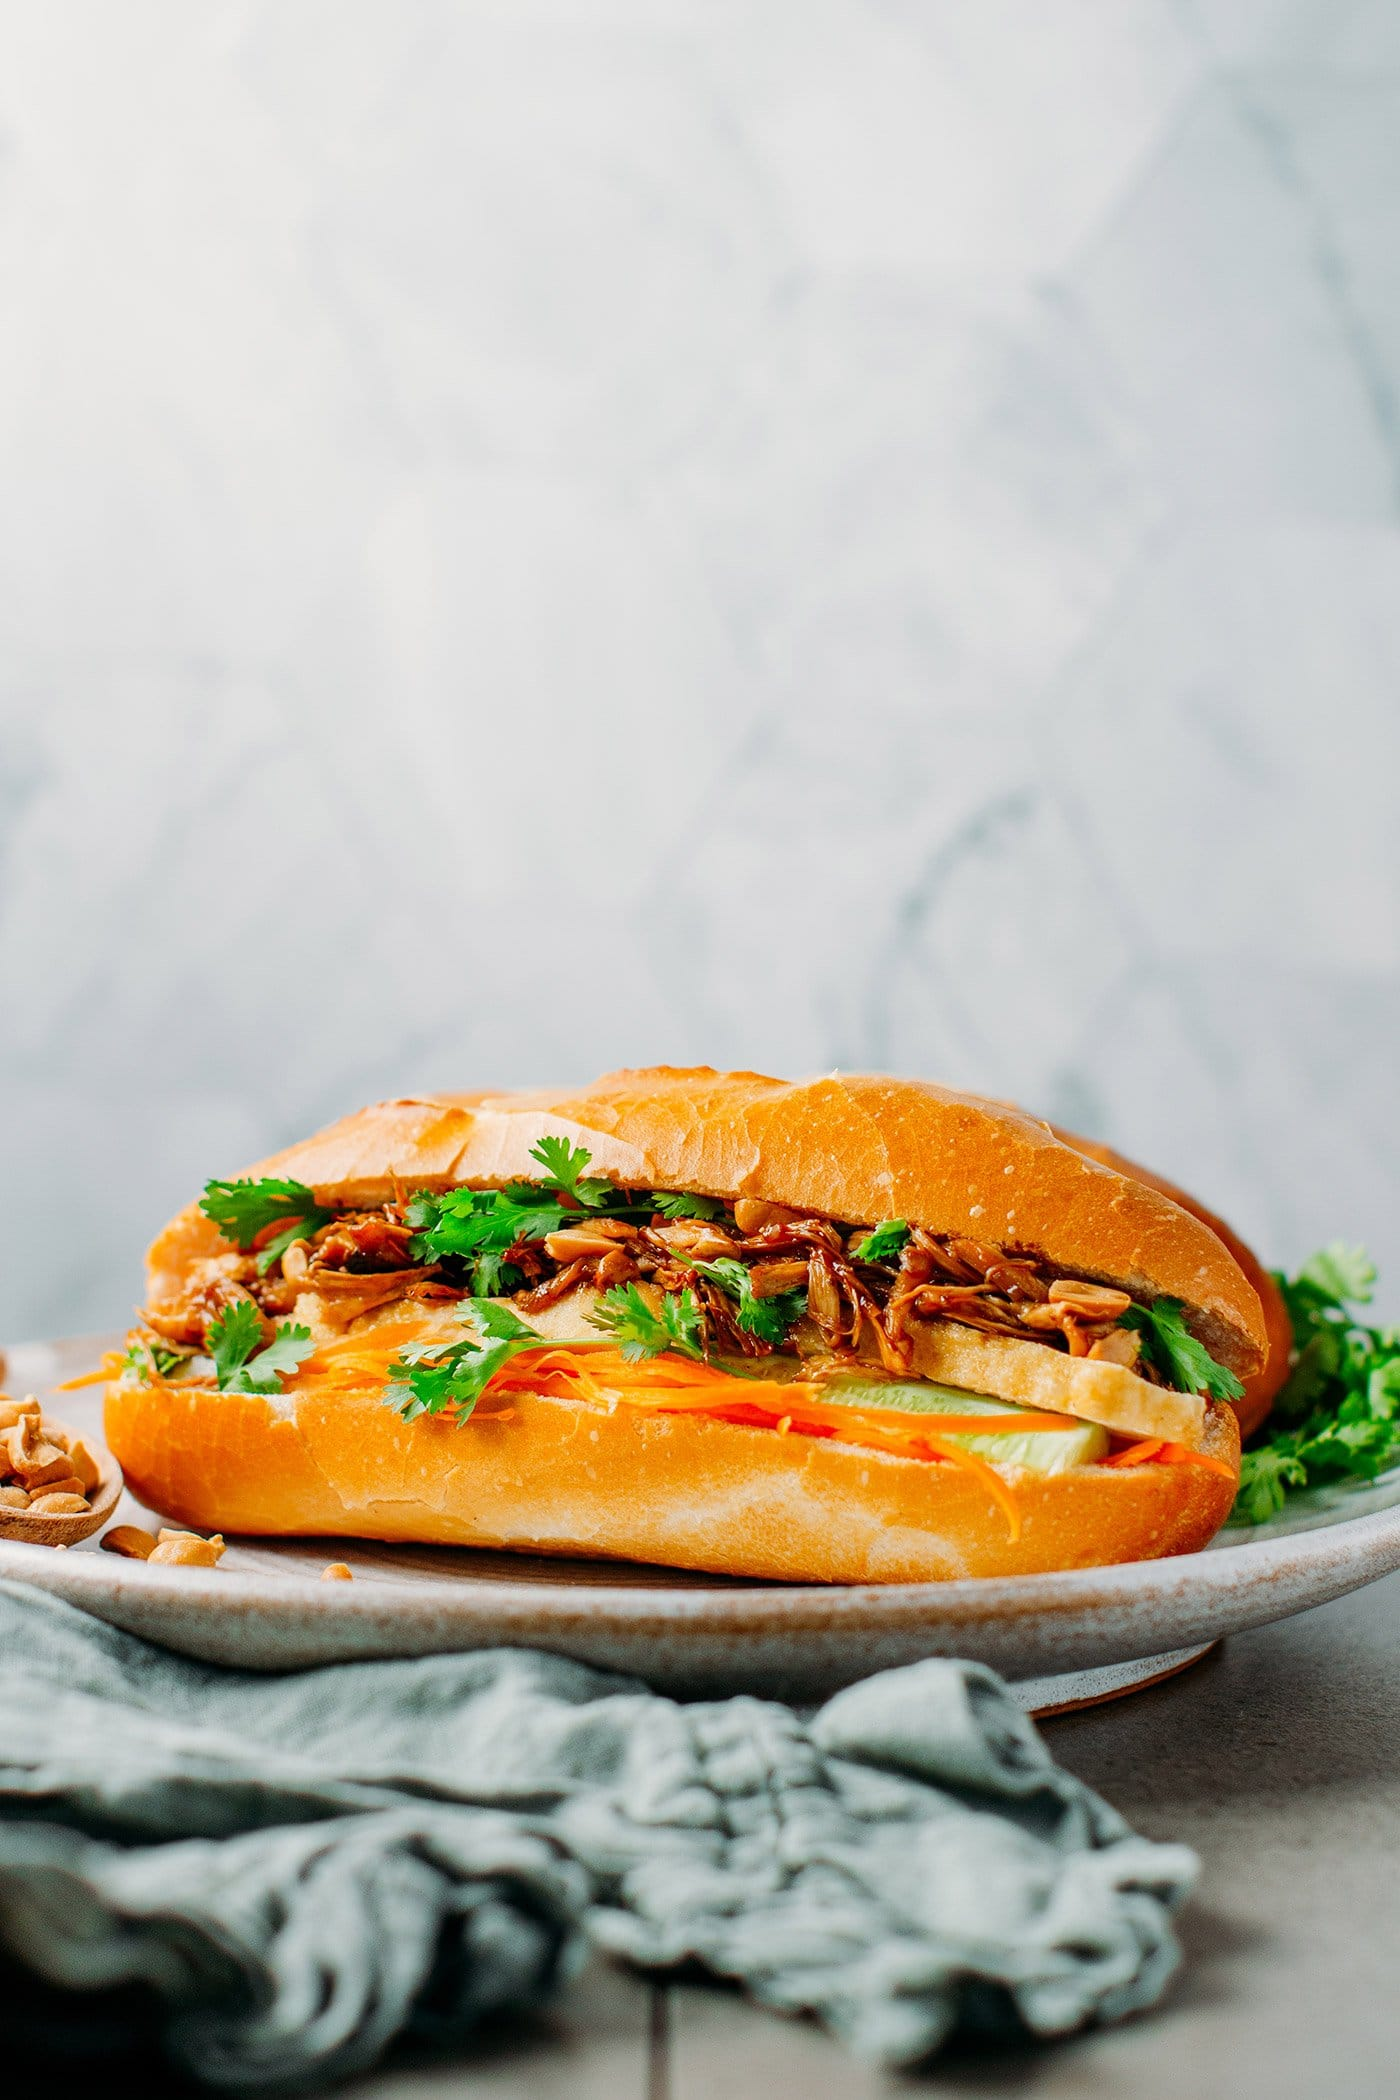 Vegan Pulled Mushroom Banh Mi